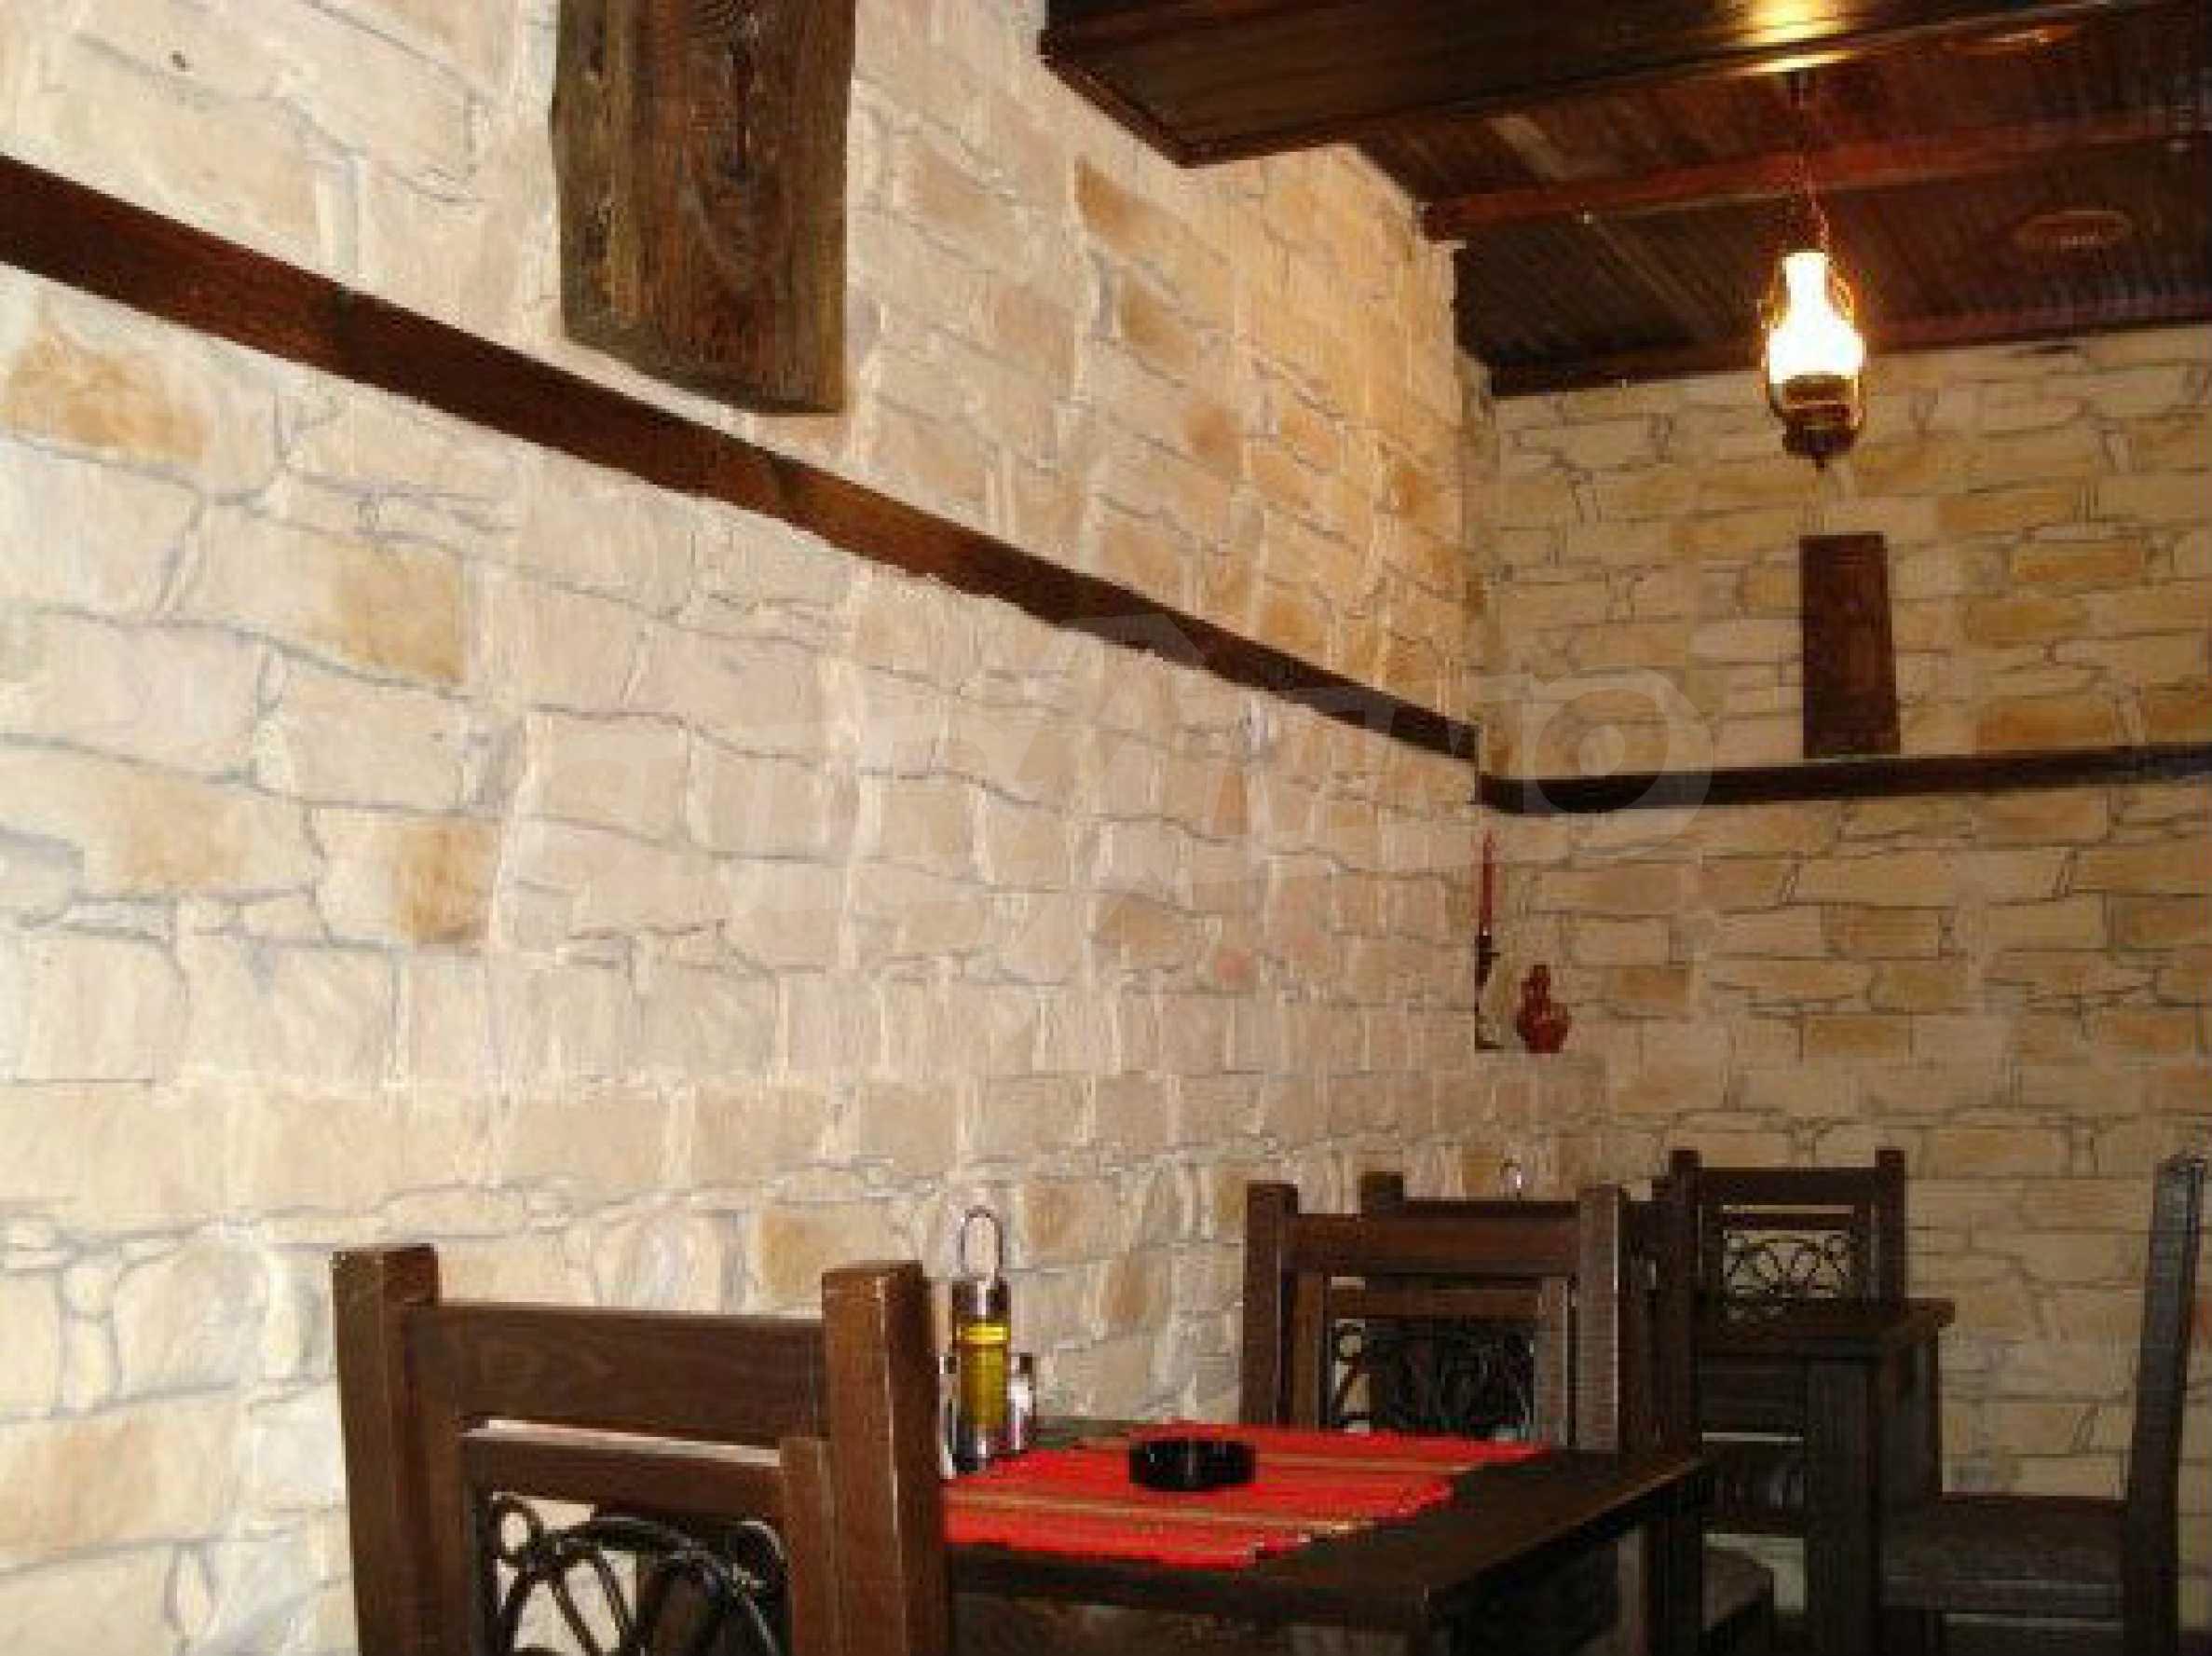 Hotelanlage mit Restaurant am Ufer des Flusses Osam in Lovech 55